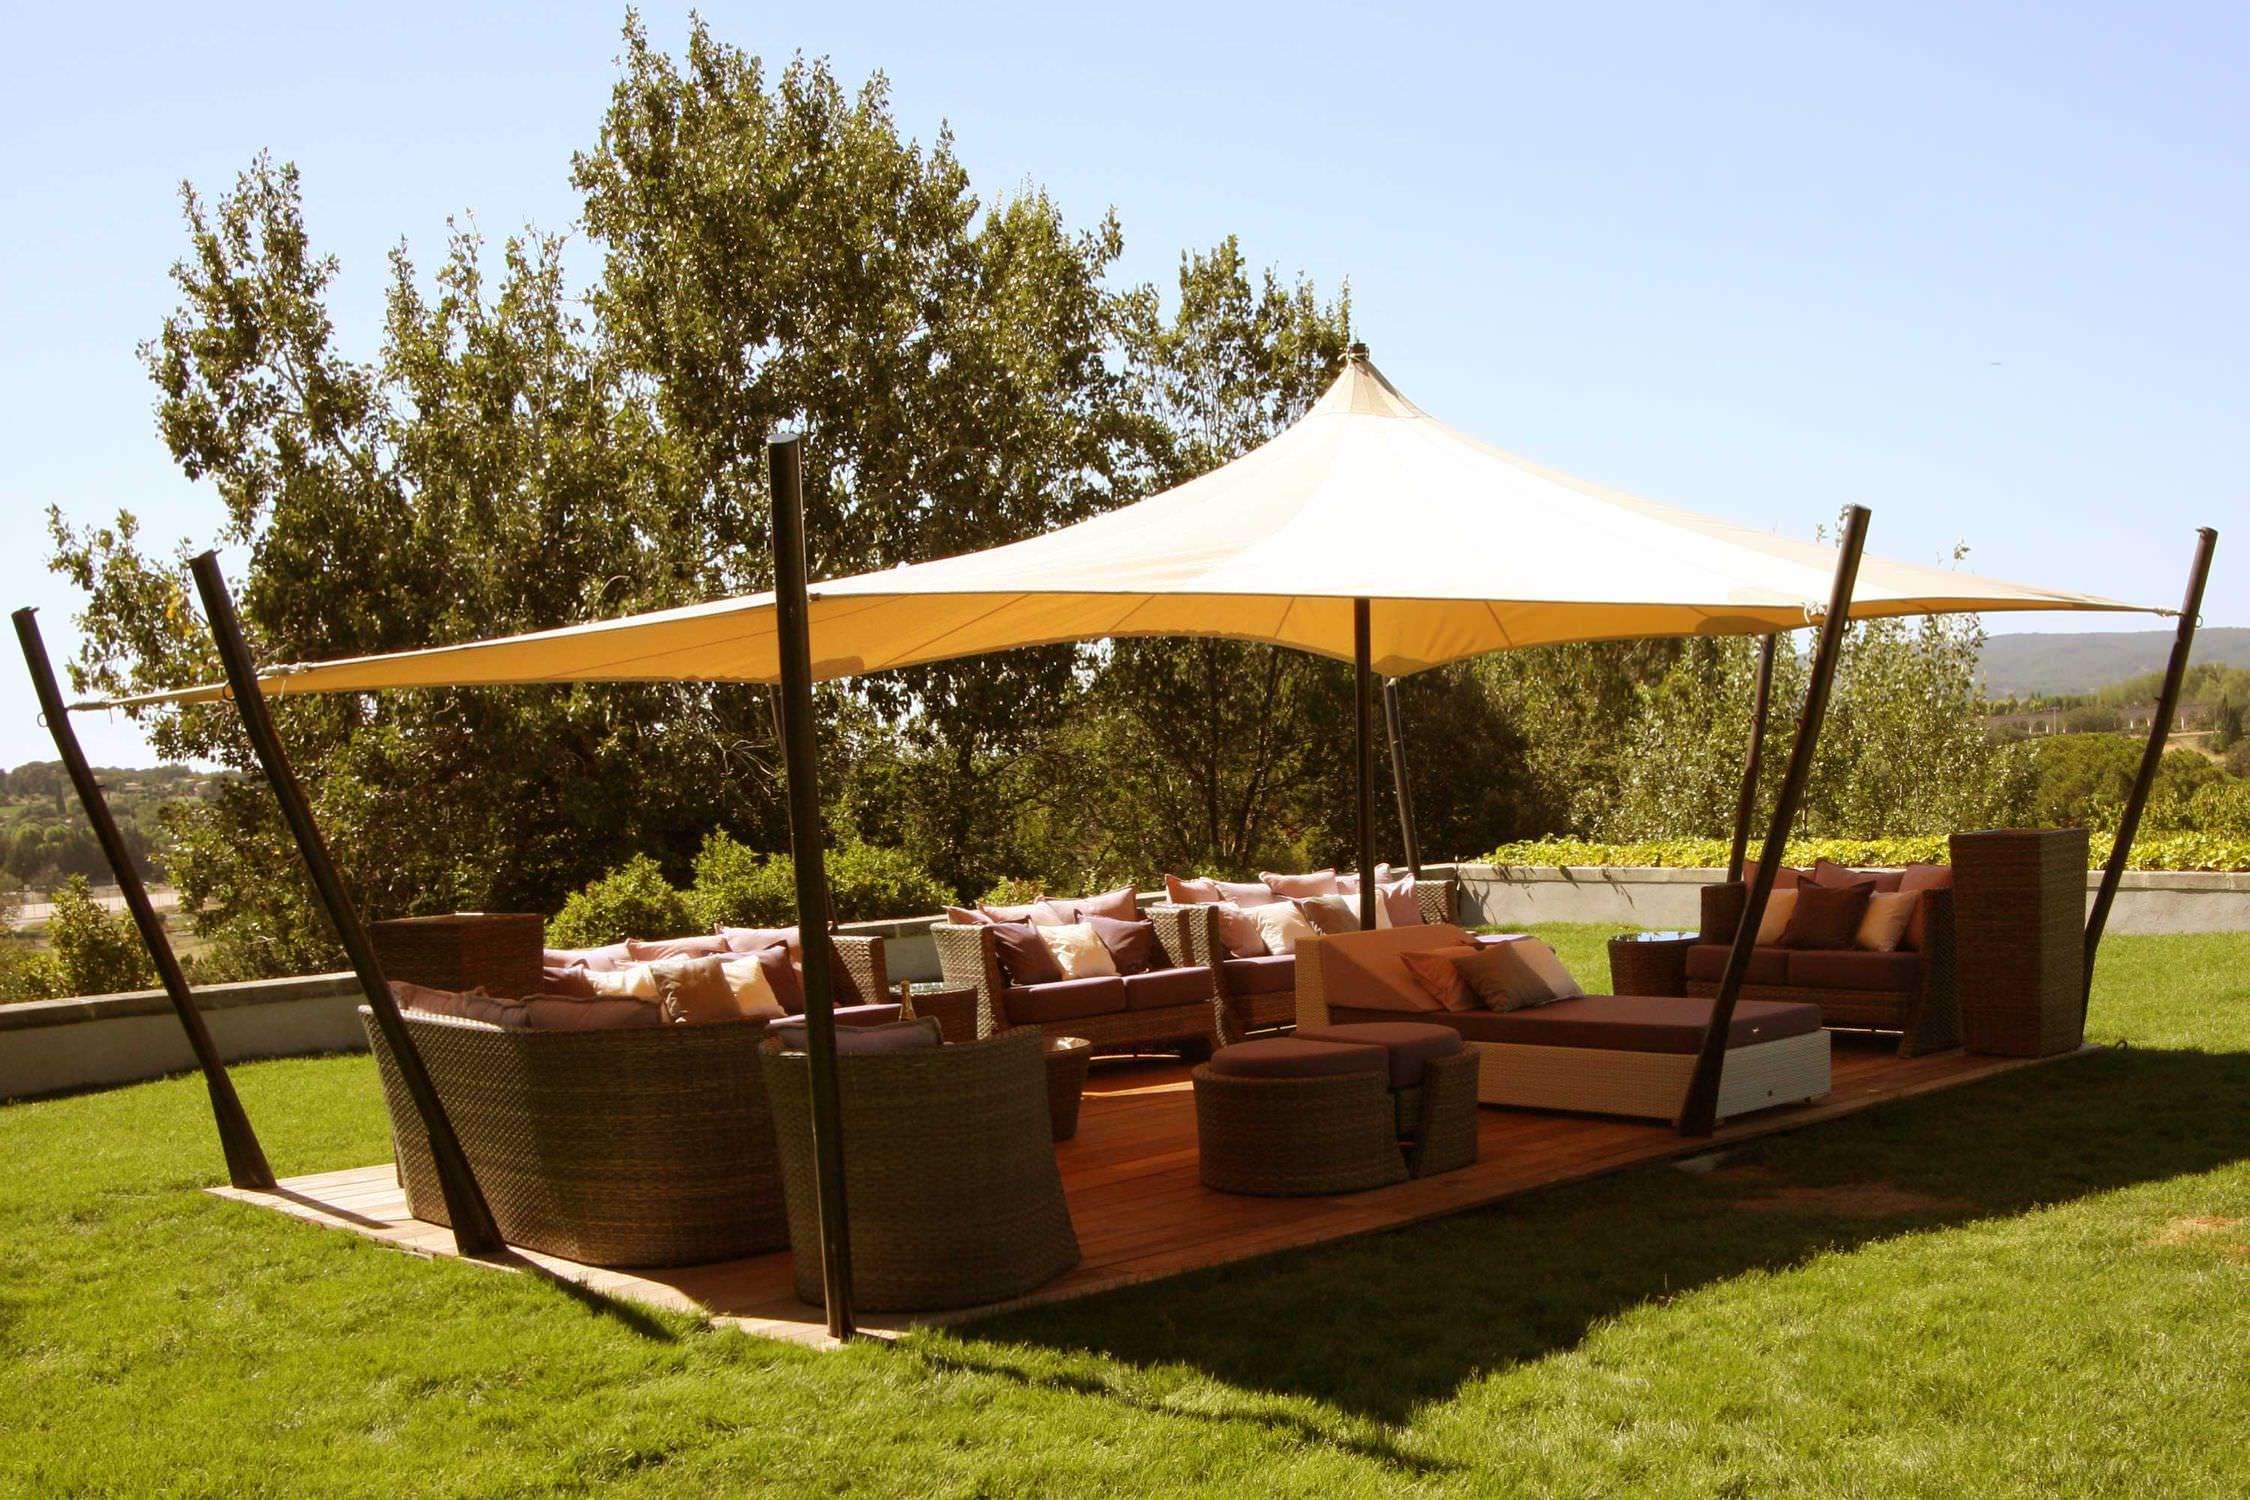 Fabric Roof Gazebo - Tente Touareg Jardin Aixois - Atelier ... tout Toile Triangle Jardin